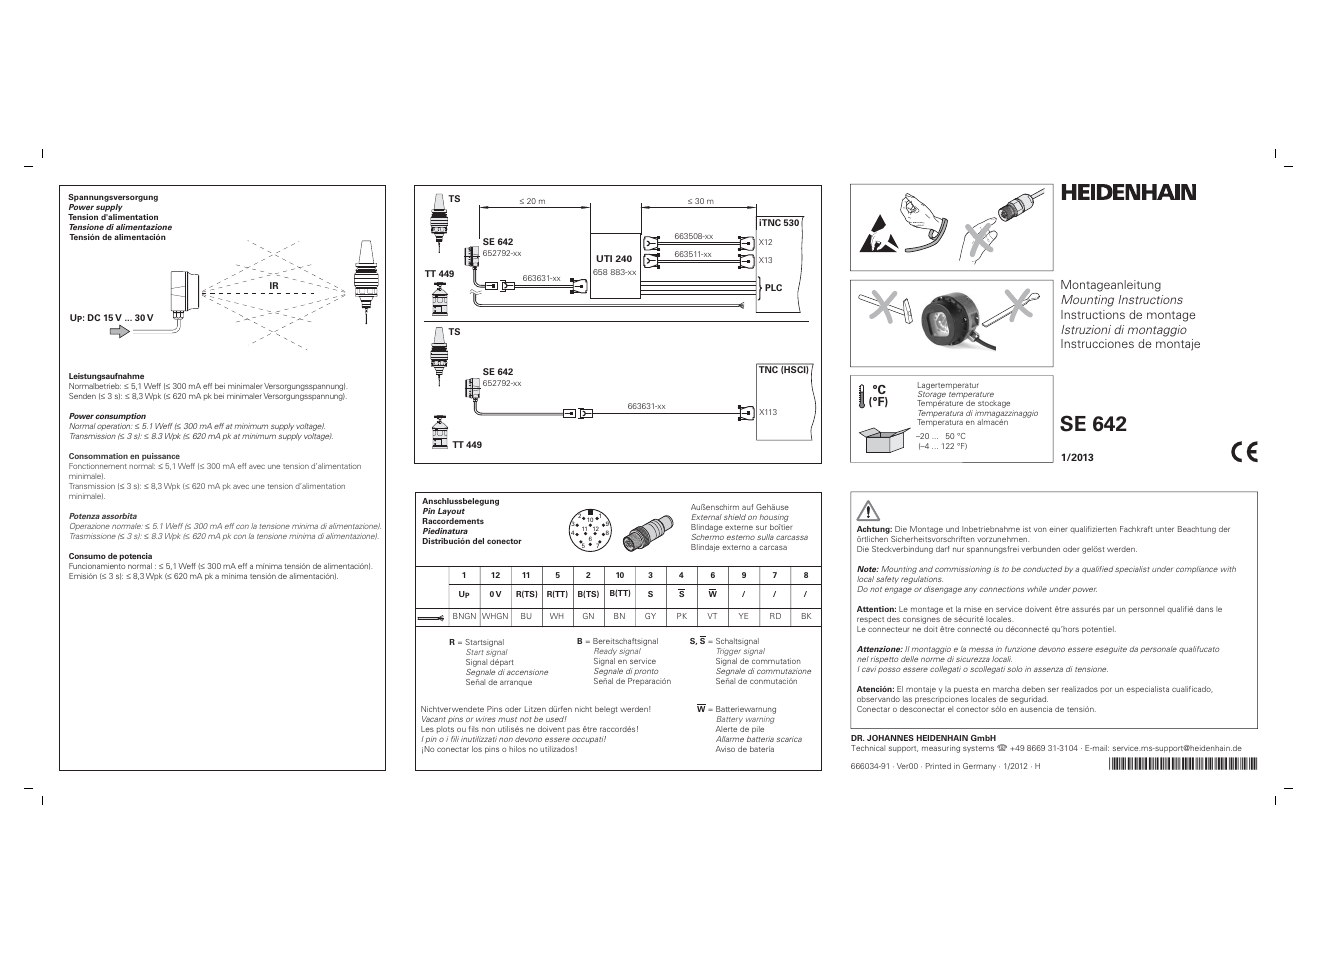 heidenhain itnc 530 service manual pdf